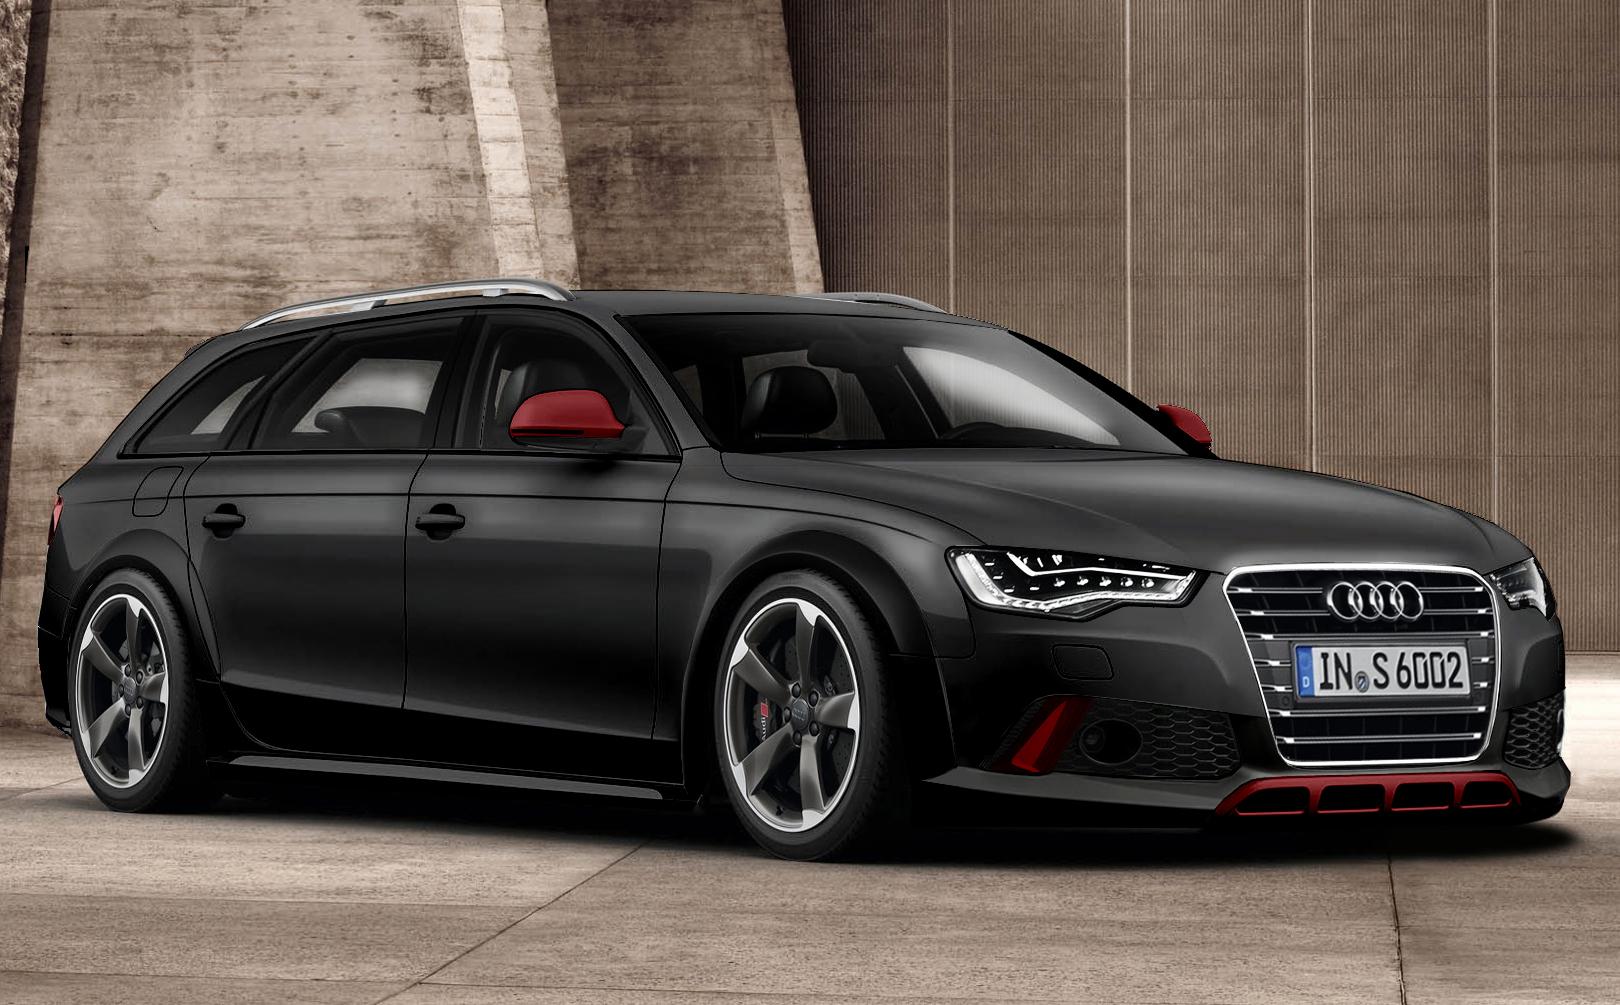 Audi A4 2013 Allroad Rs6 Red Black By Psykomysik On Deviantart